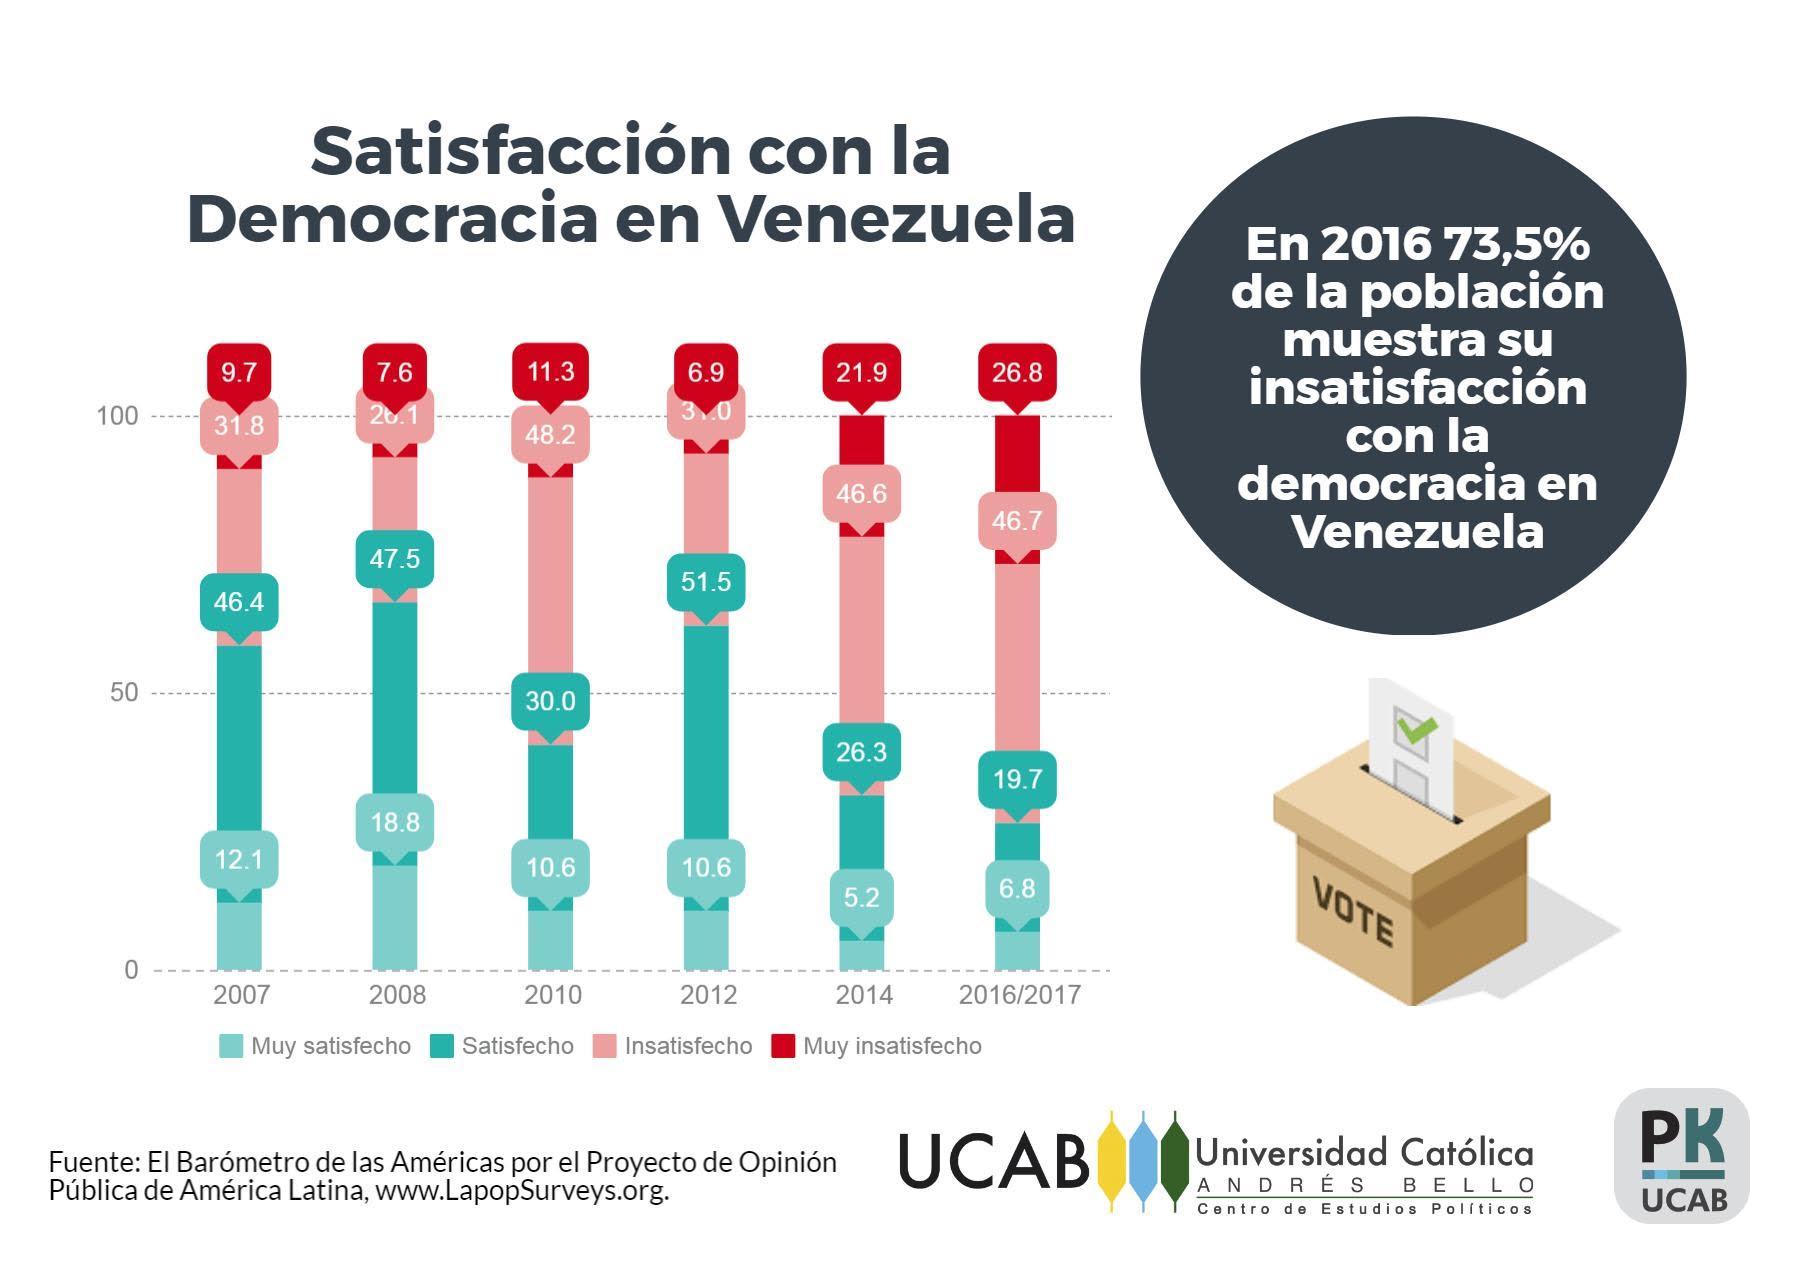 DemocraciaenVenezuela